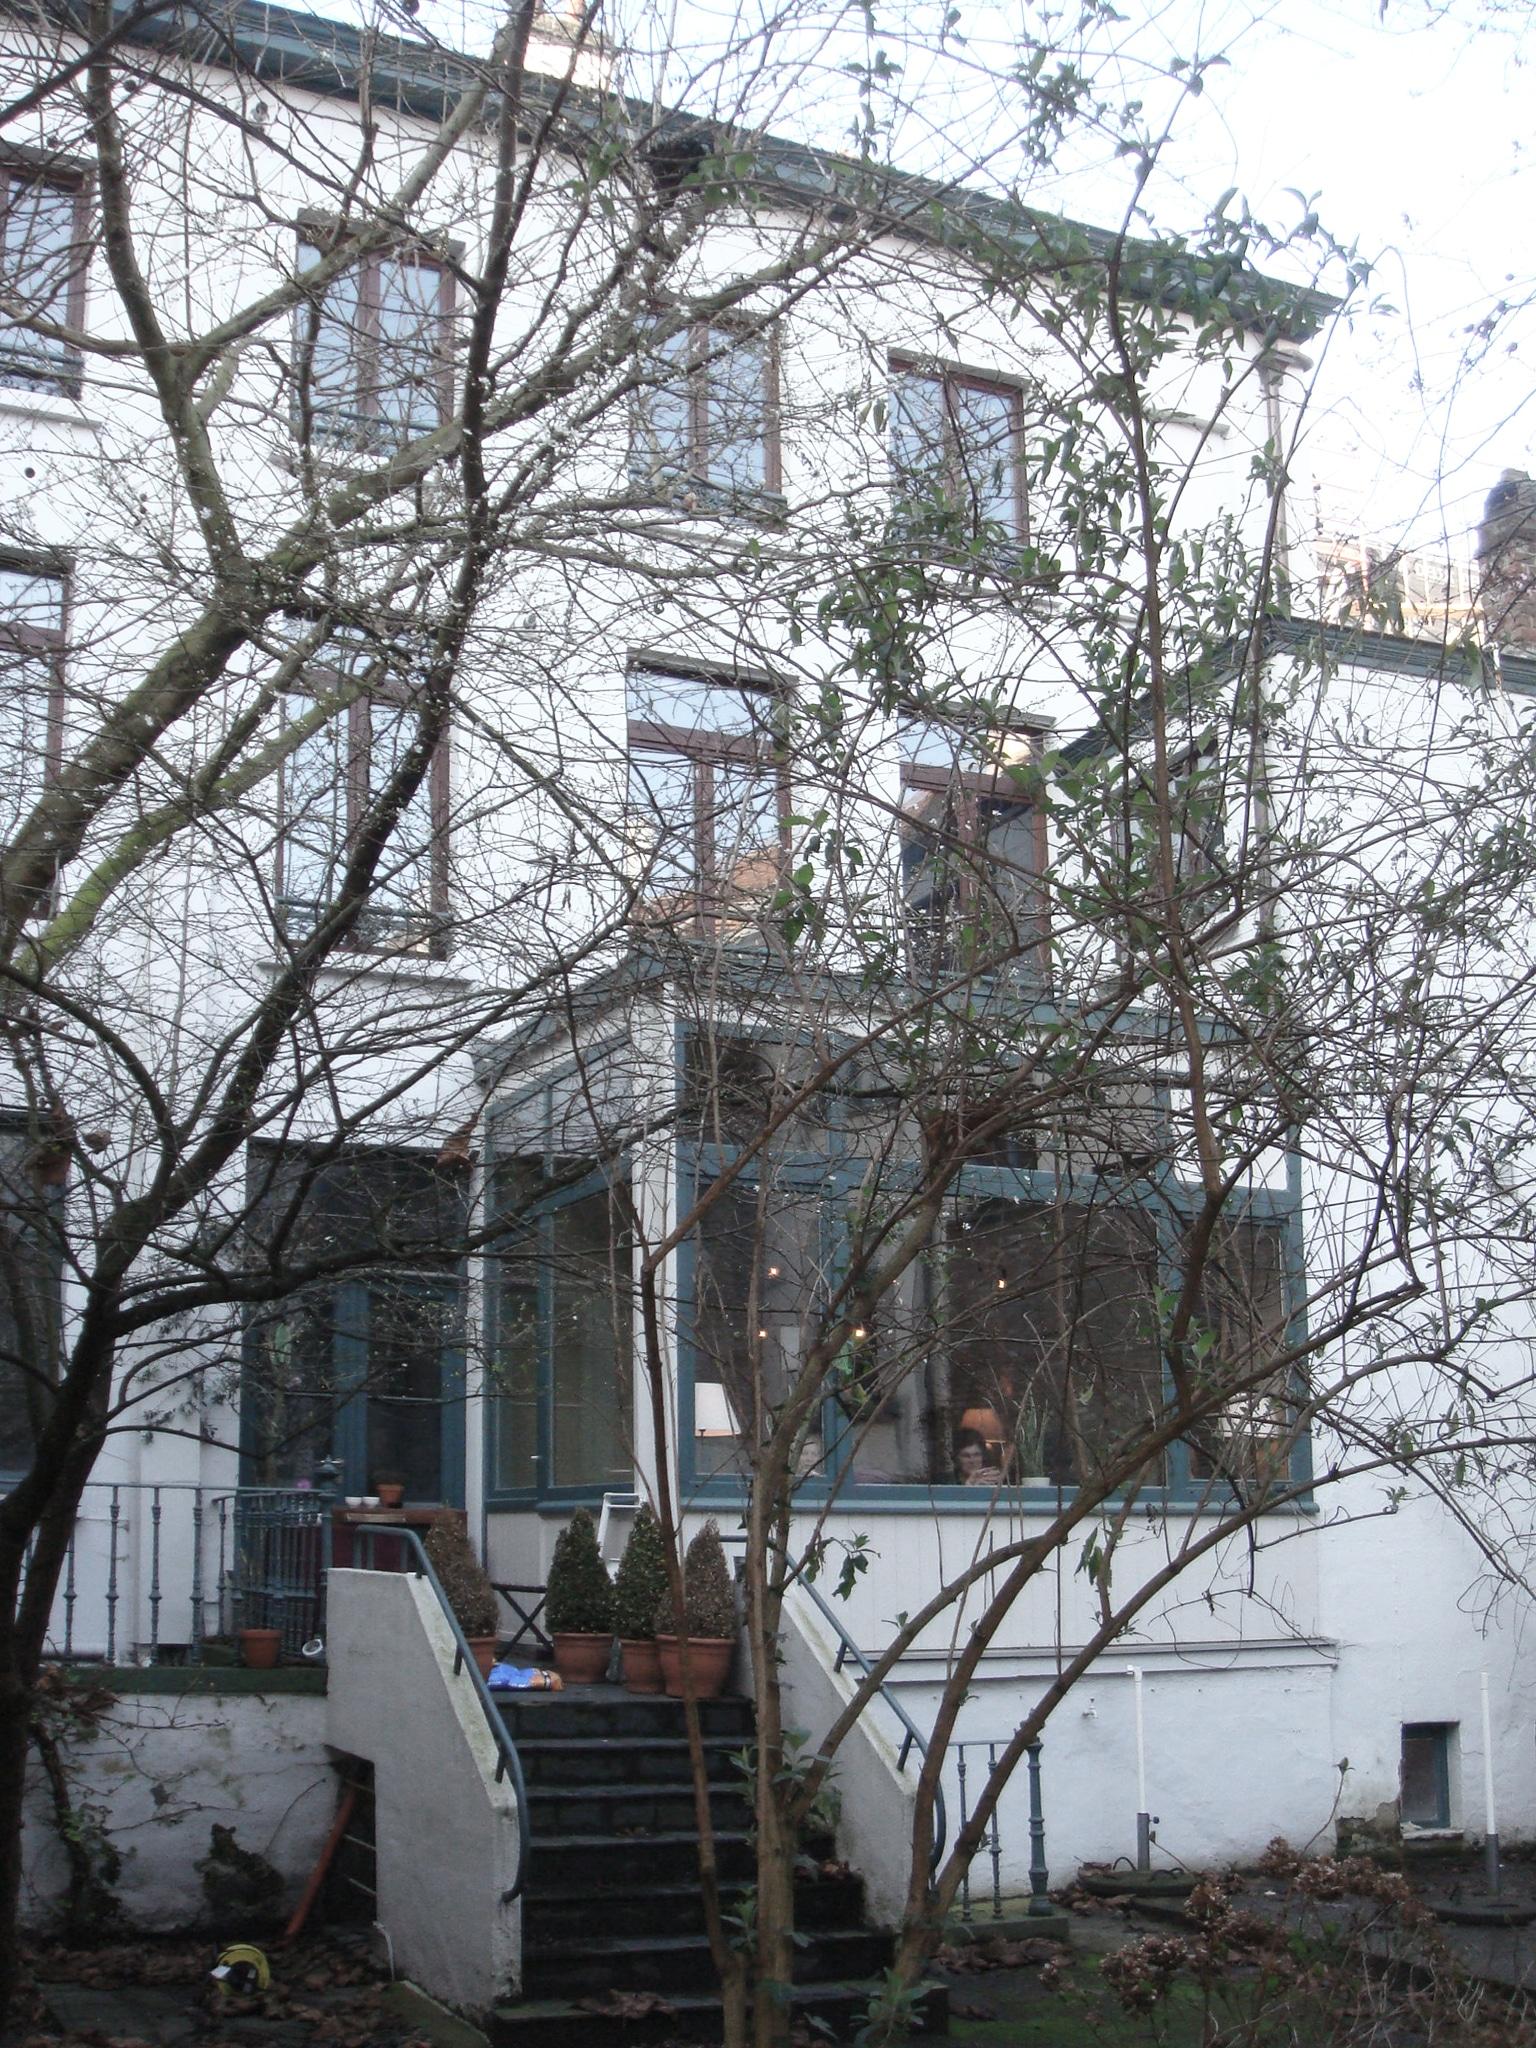 DSC07469 | Baeyens & Beck architecten Gent | architect nieuwbouw renovatie interieur | high end | architectenbureau